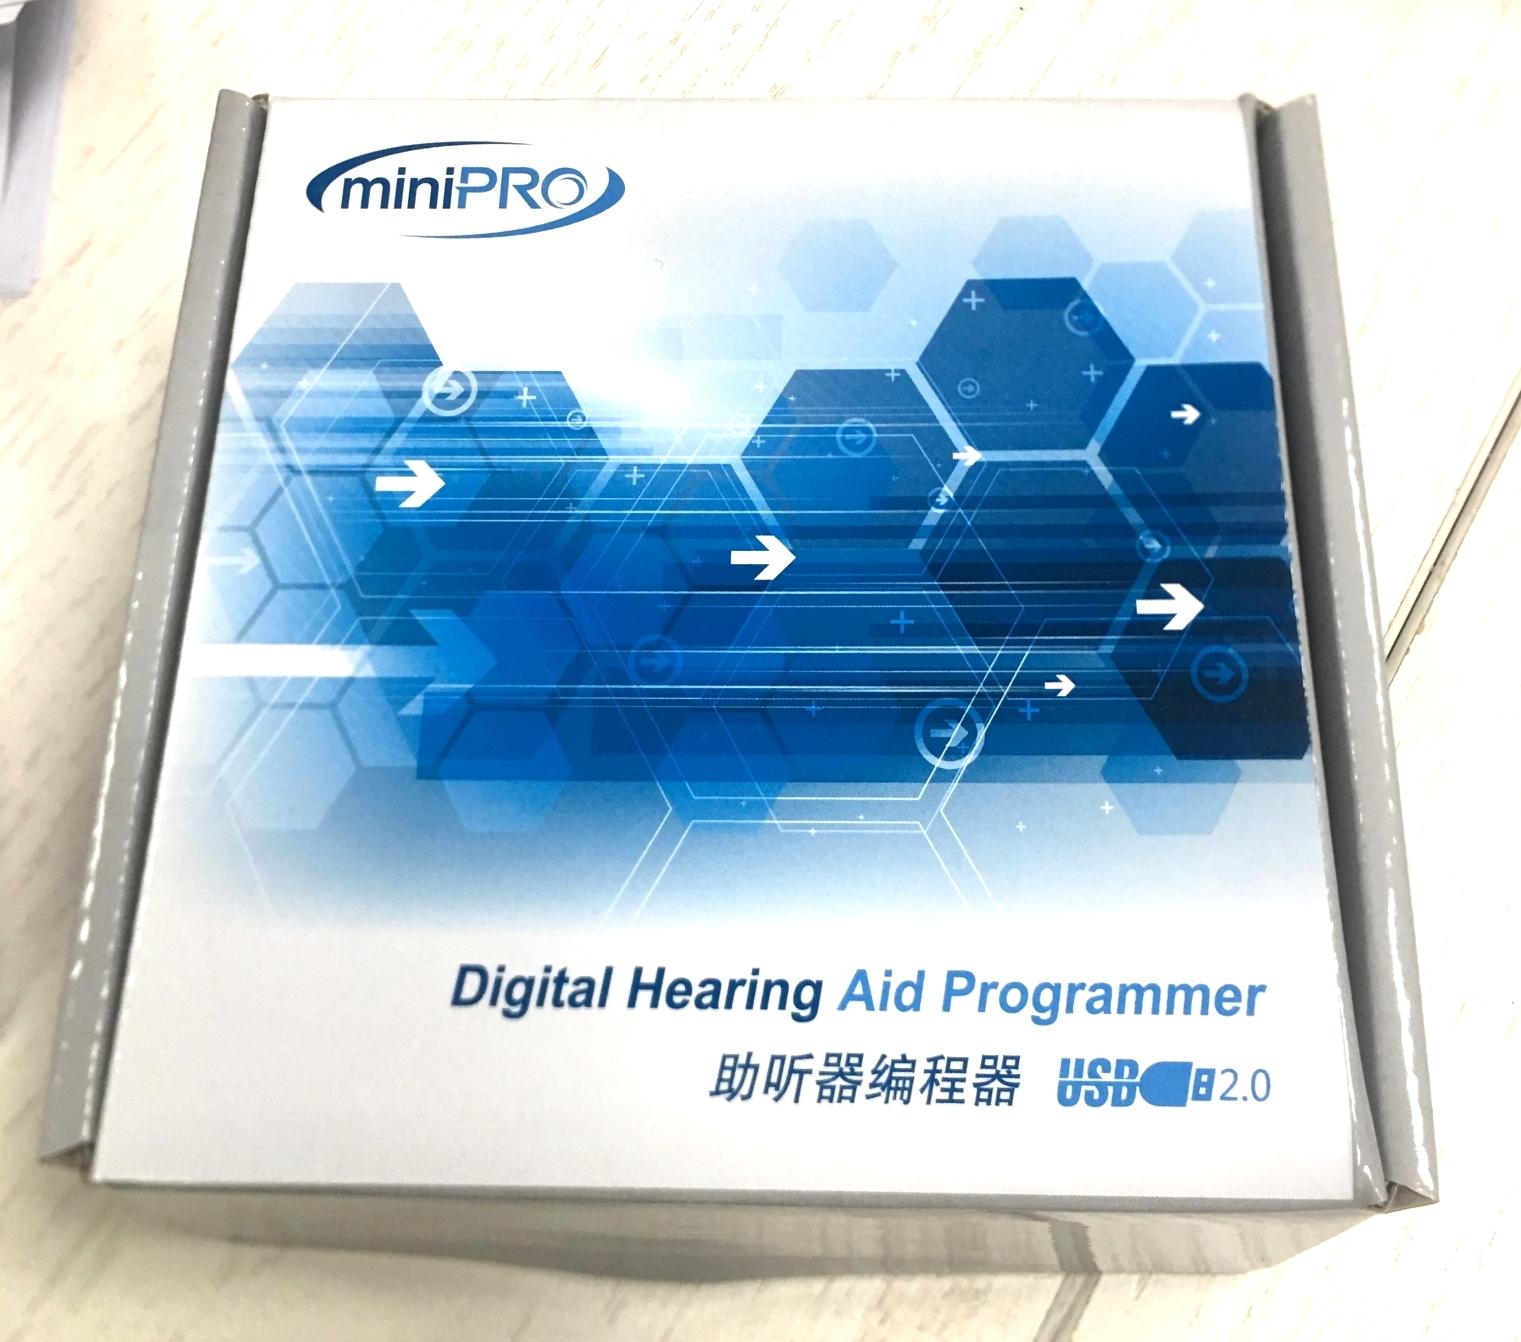 Digital hearing aid price,Digital hearing aid,Digital hearing aid quote market